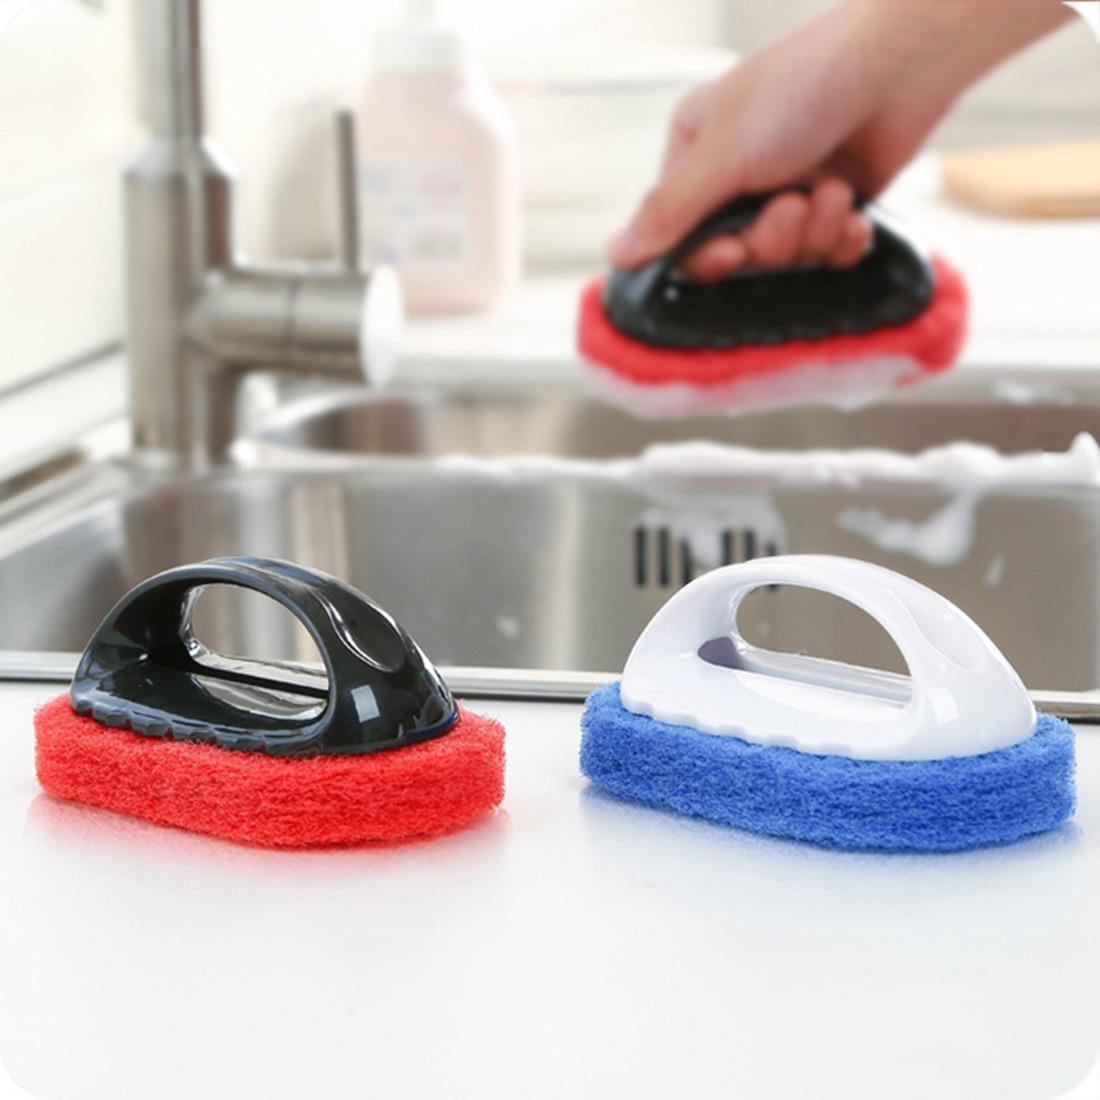 2016 New Household Supplies Handle Hard Sponge Cleaning Brush Sanitary Tools Brusher